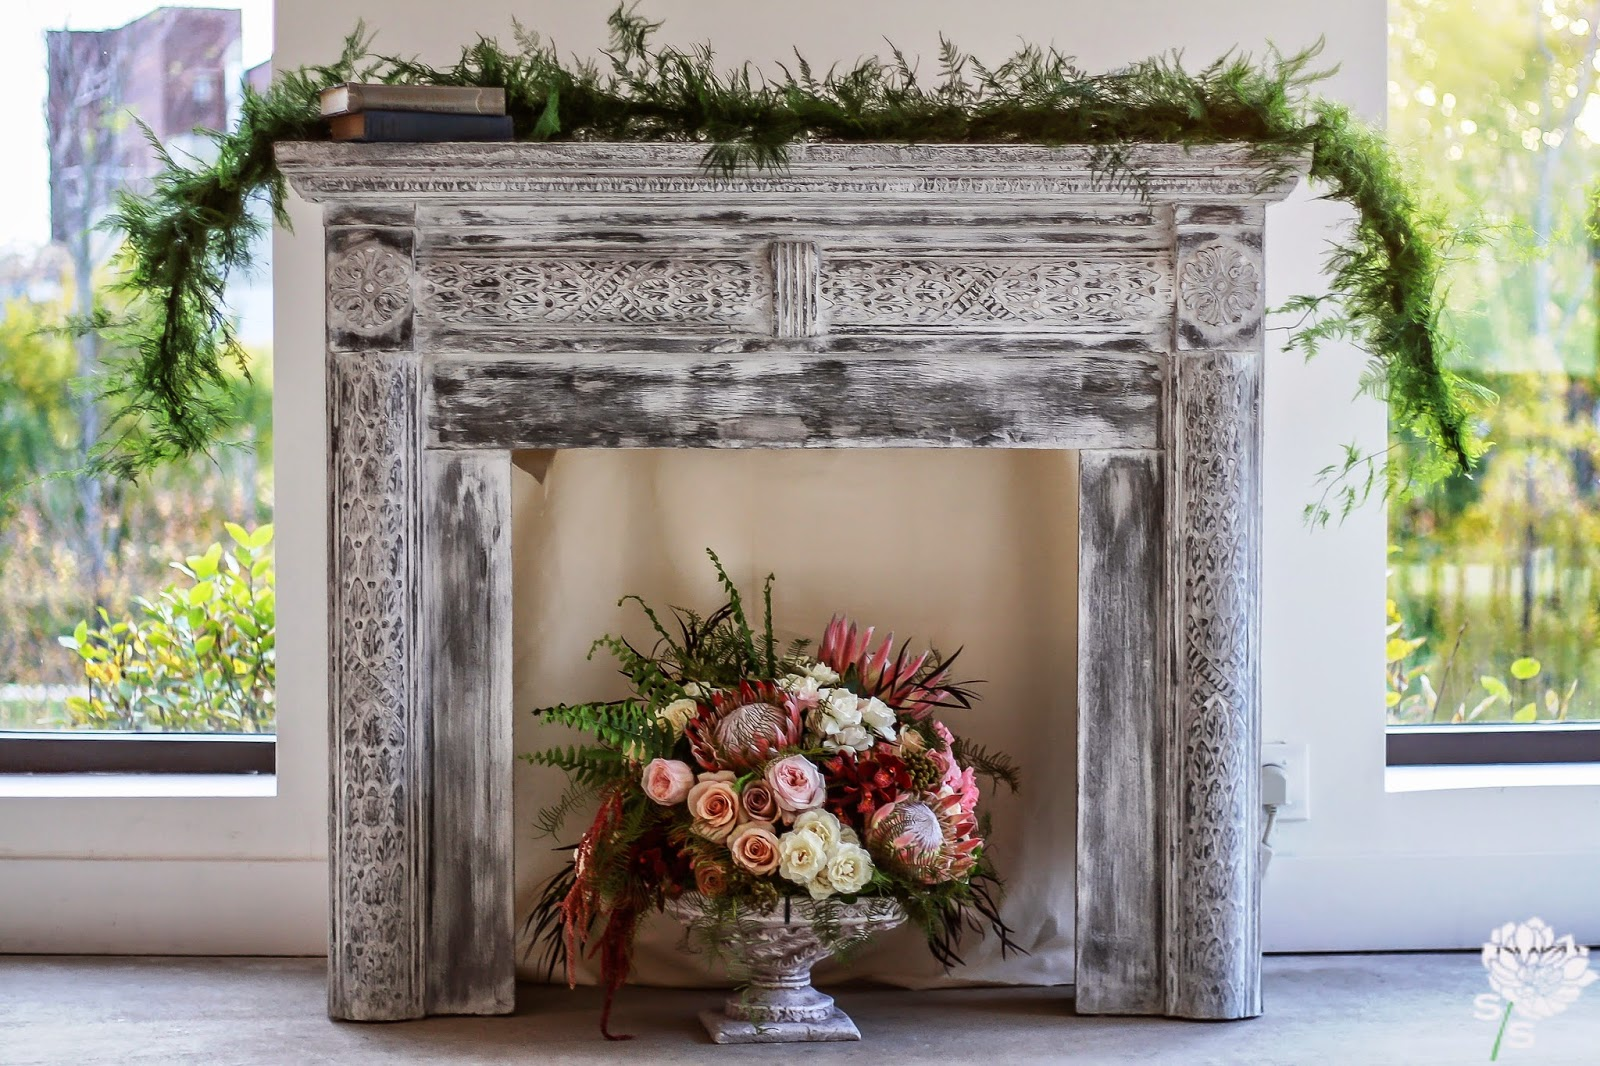 The Roundhouse Wedding - Beacon, NY - Hudson Valley Wedding- Mantle Garland Decor - Wedding Flowers - Splendid Stems Floral Designs